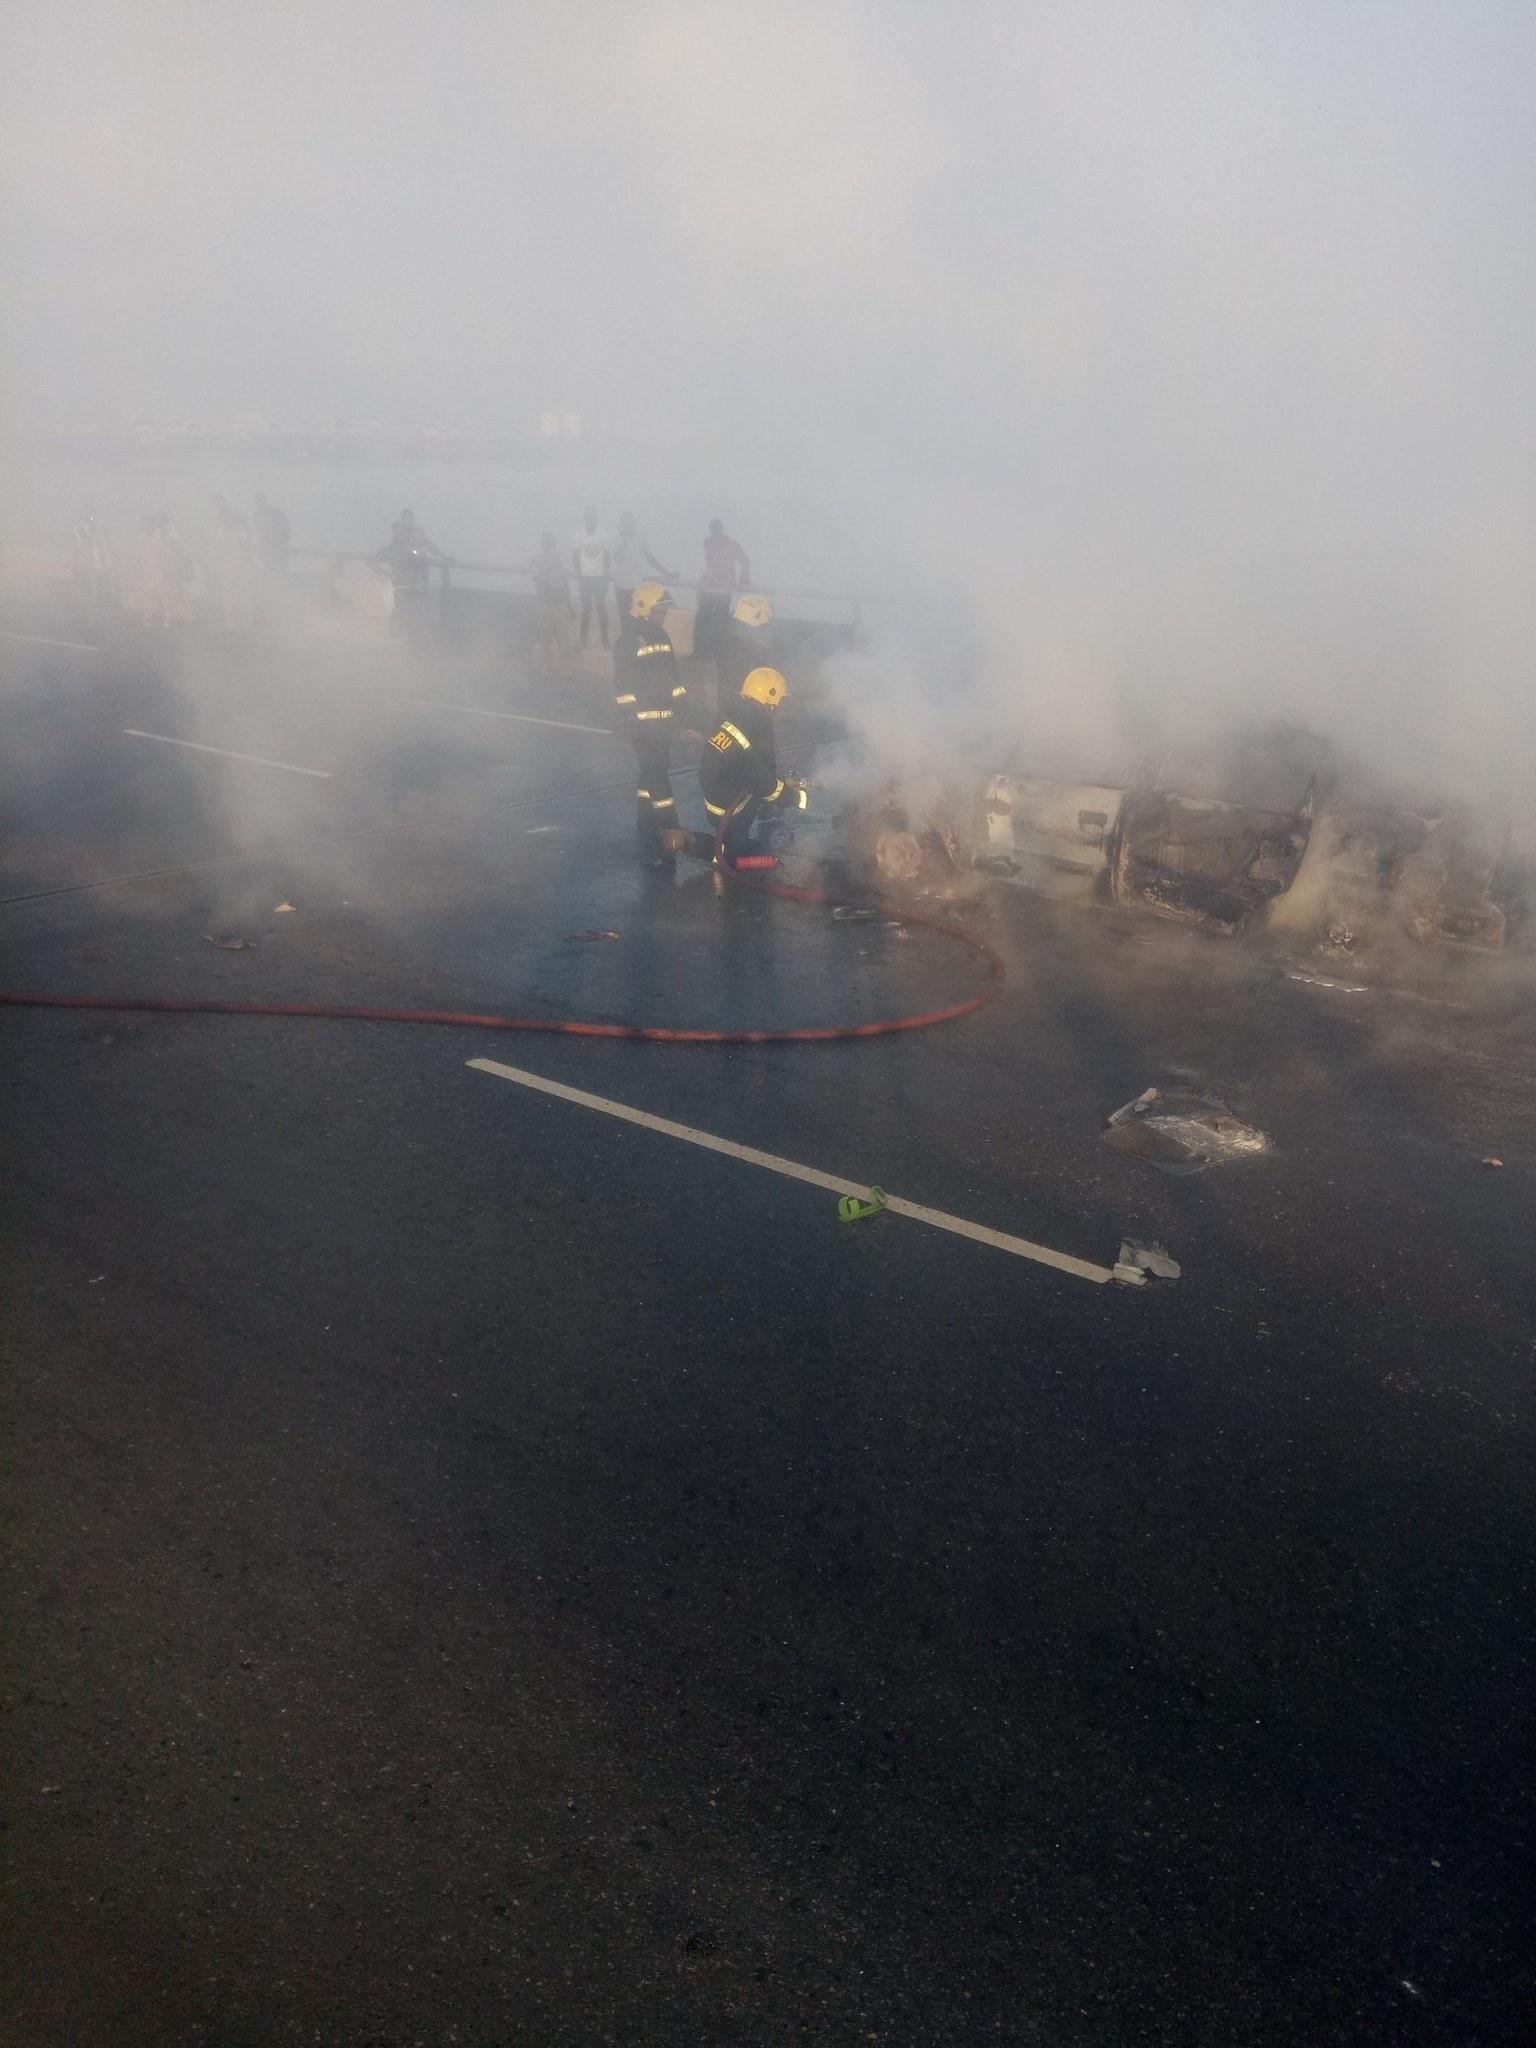 Photos: LASEMA puts out the burning mini van on Third Mainland Bridge